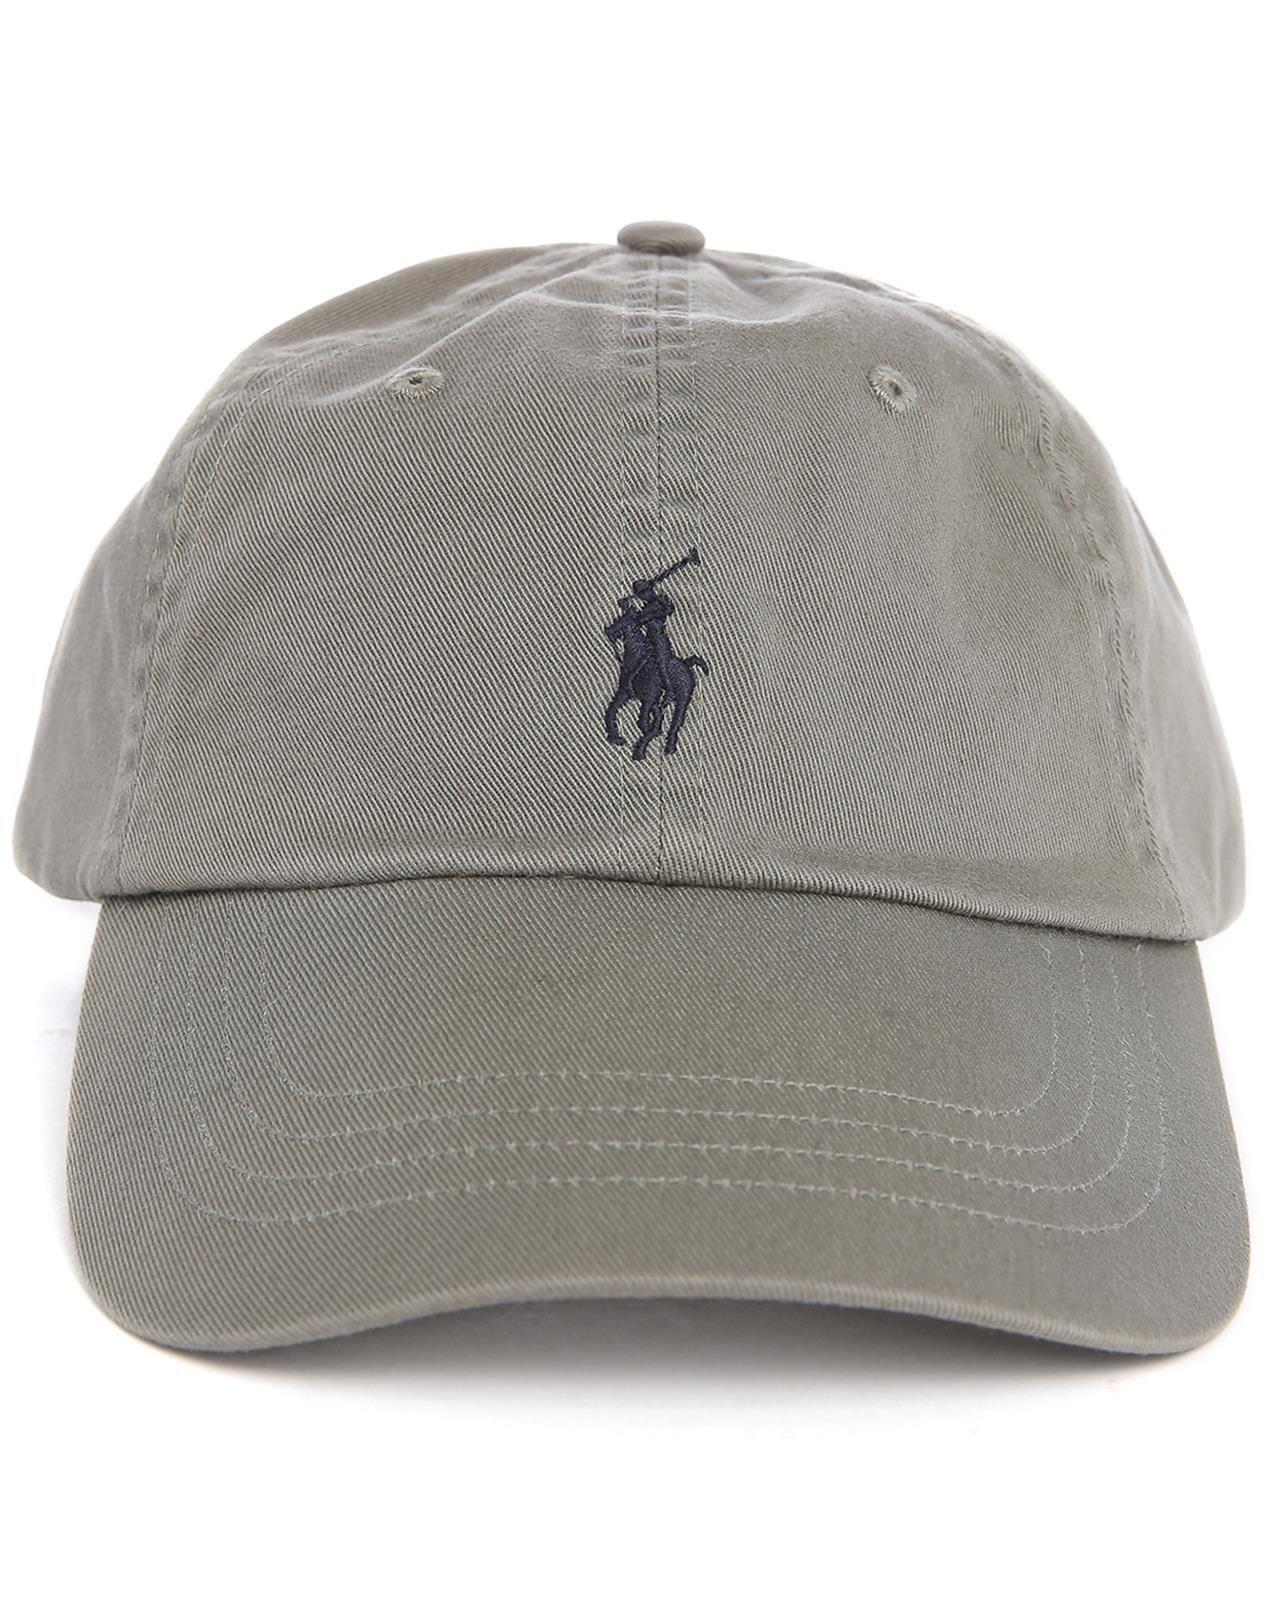 polo ralph lauren grey classic logo cap in gray for men beige lyst. Black Bedroom Furniture Sets. Home Design Ideas